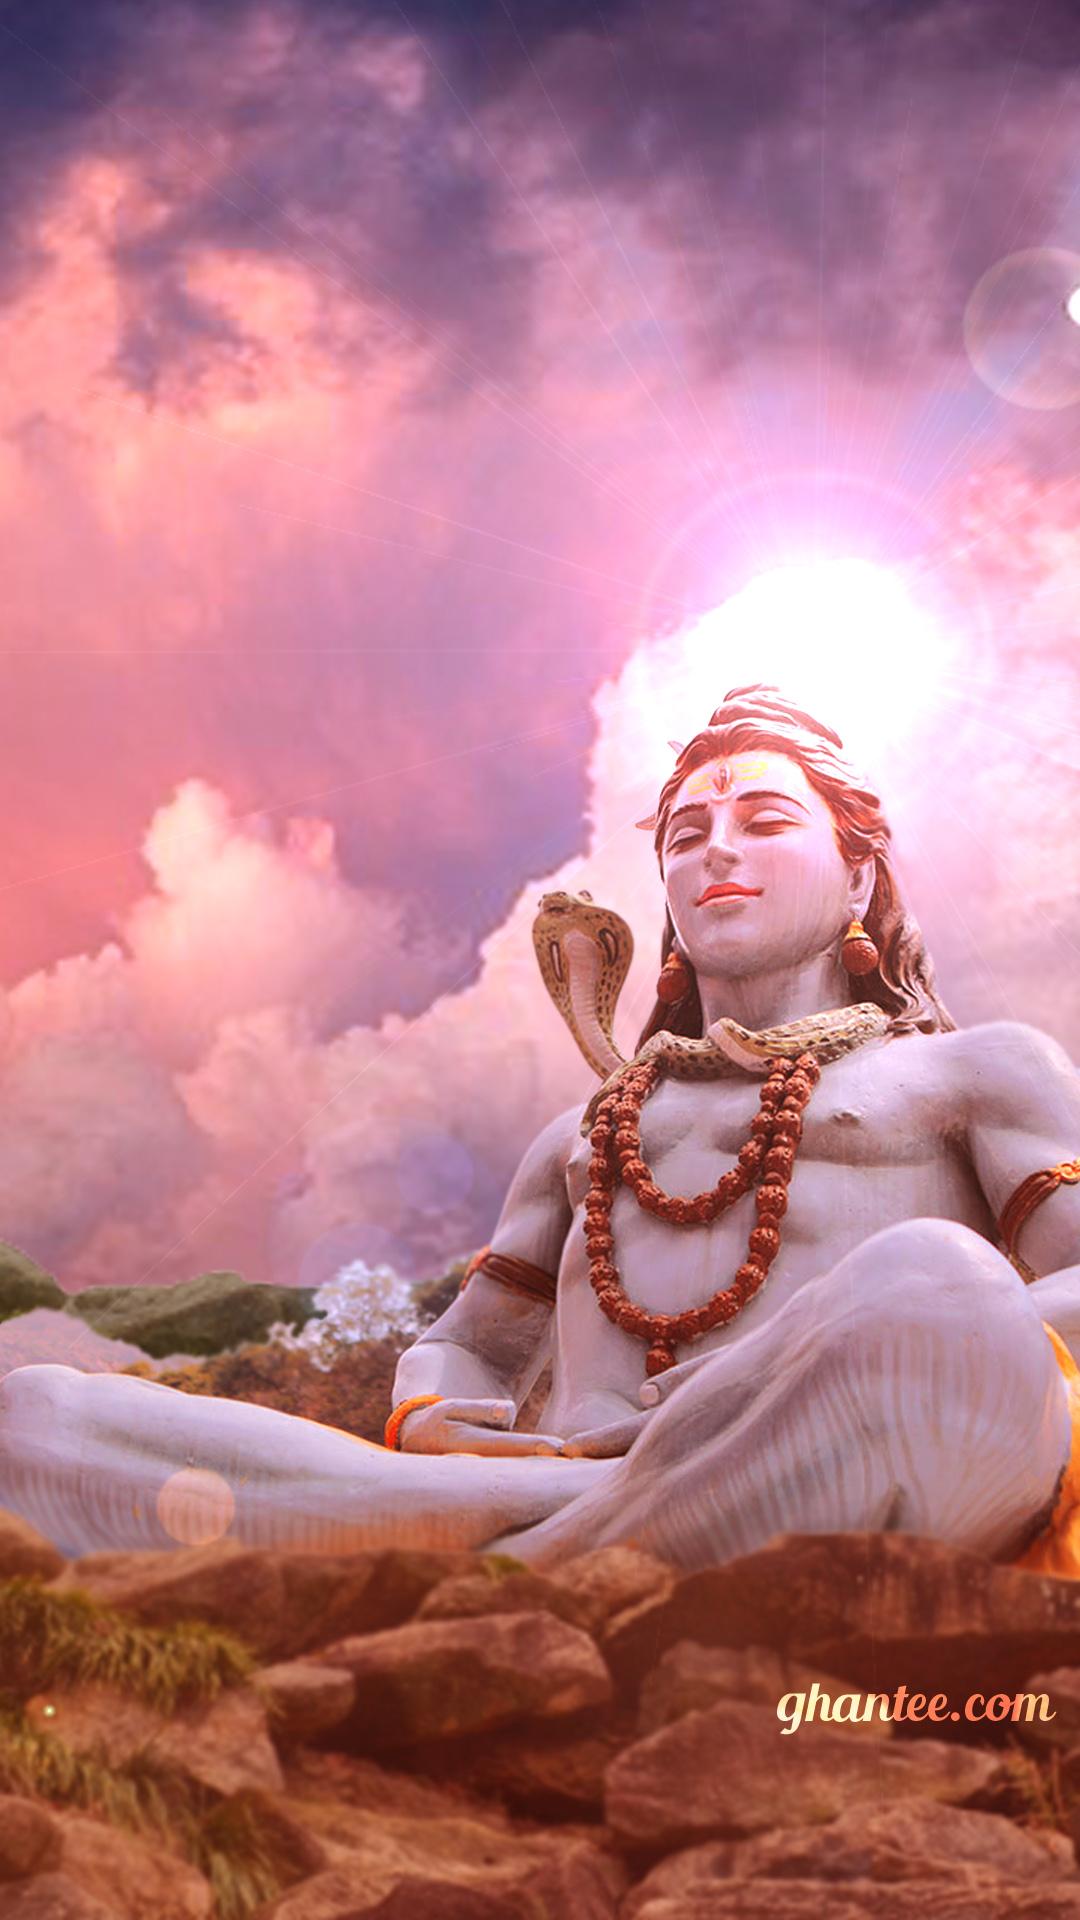 mahadev most beautiful image